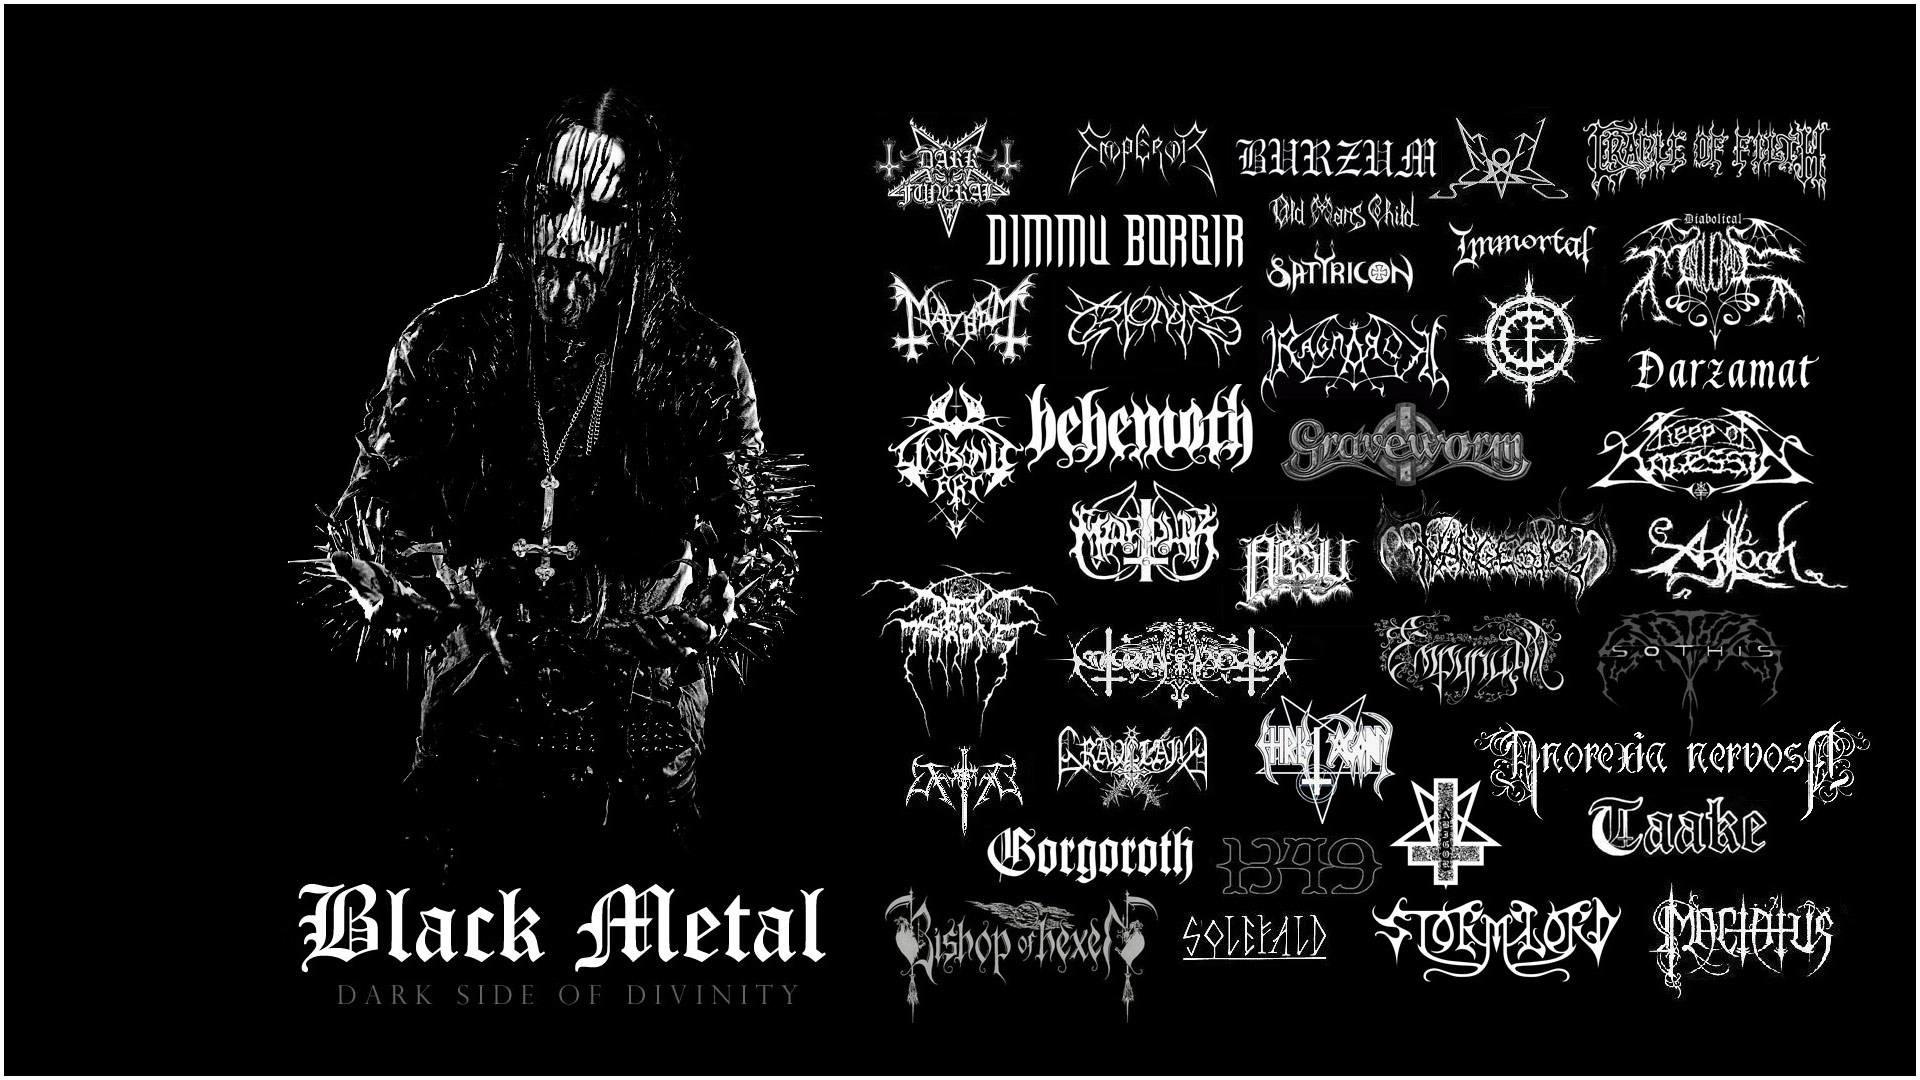 Heavy Metal Bands Wallpaper 39 Images